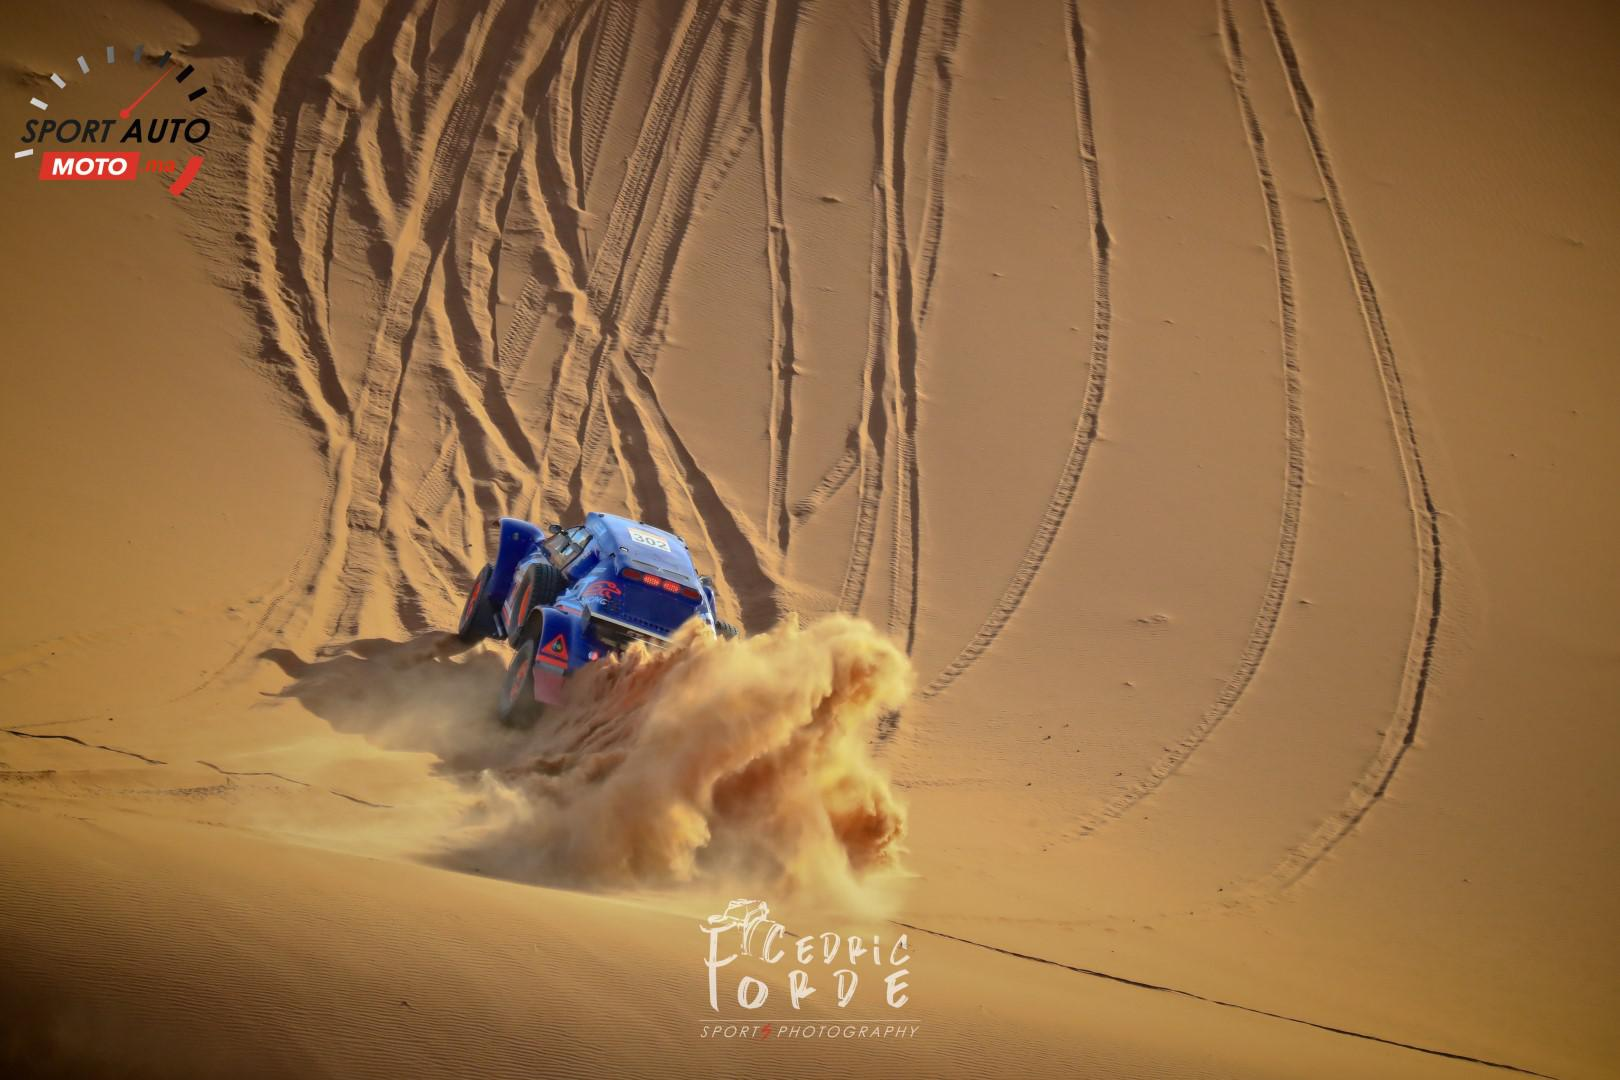 hearts-of-morocco-2018-cherednikov-et-engel-vainqueurs-sur-les-dunes-898-3.jpg